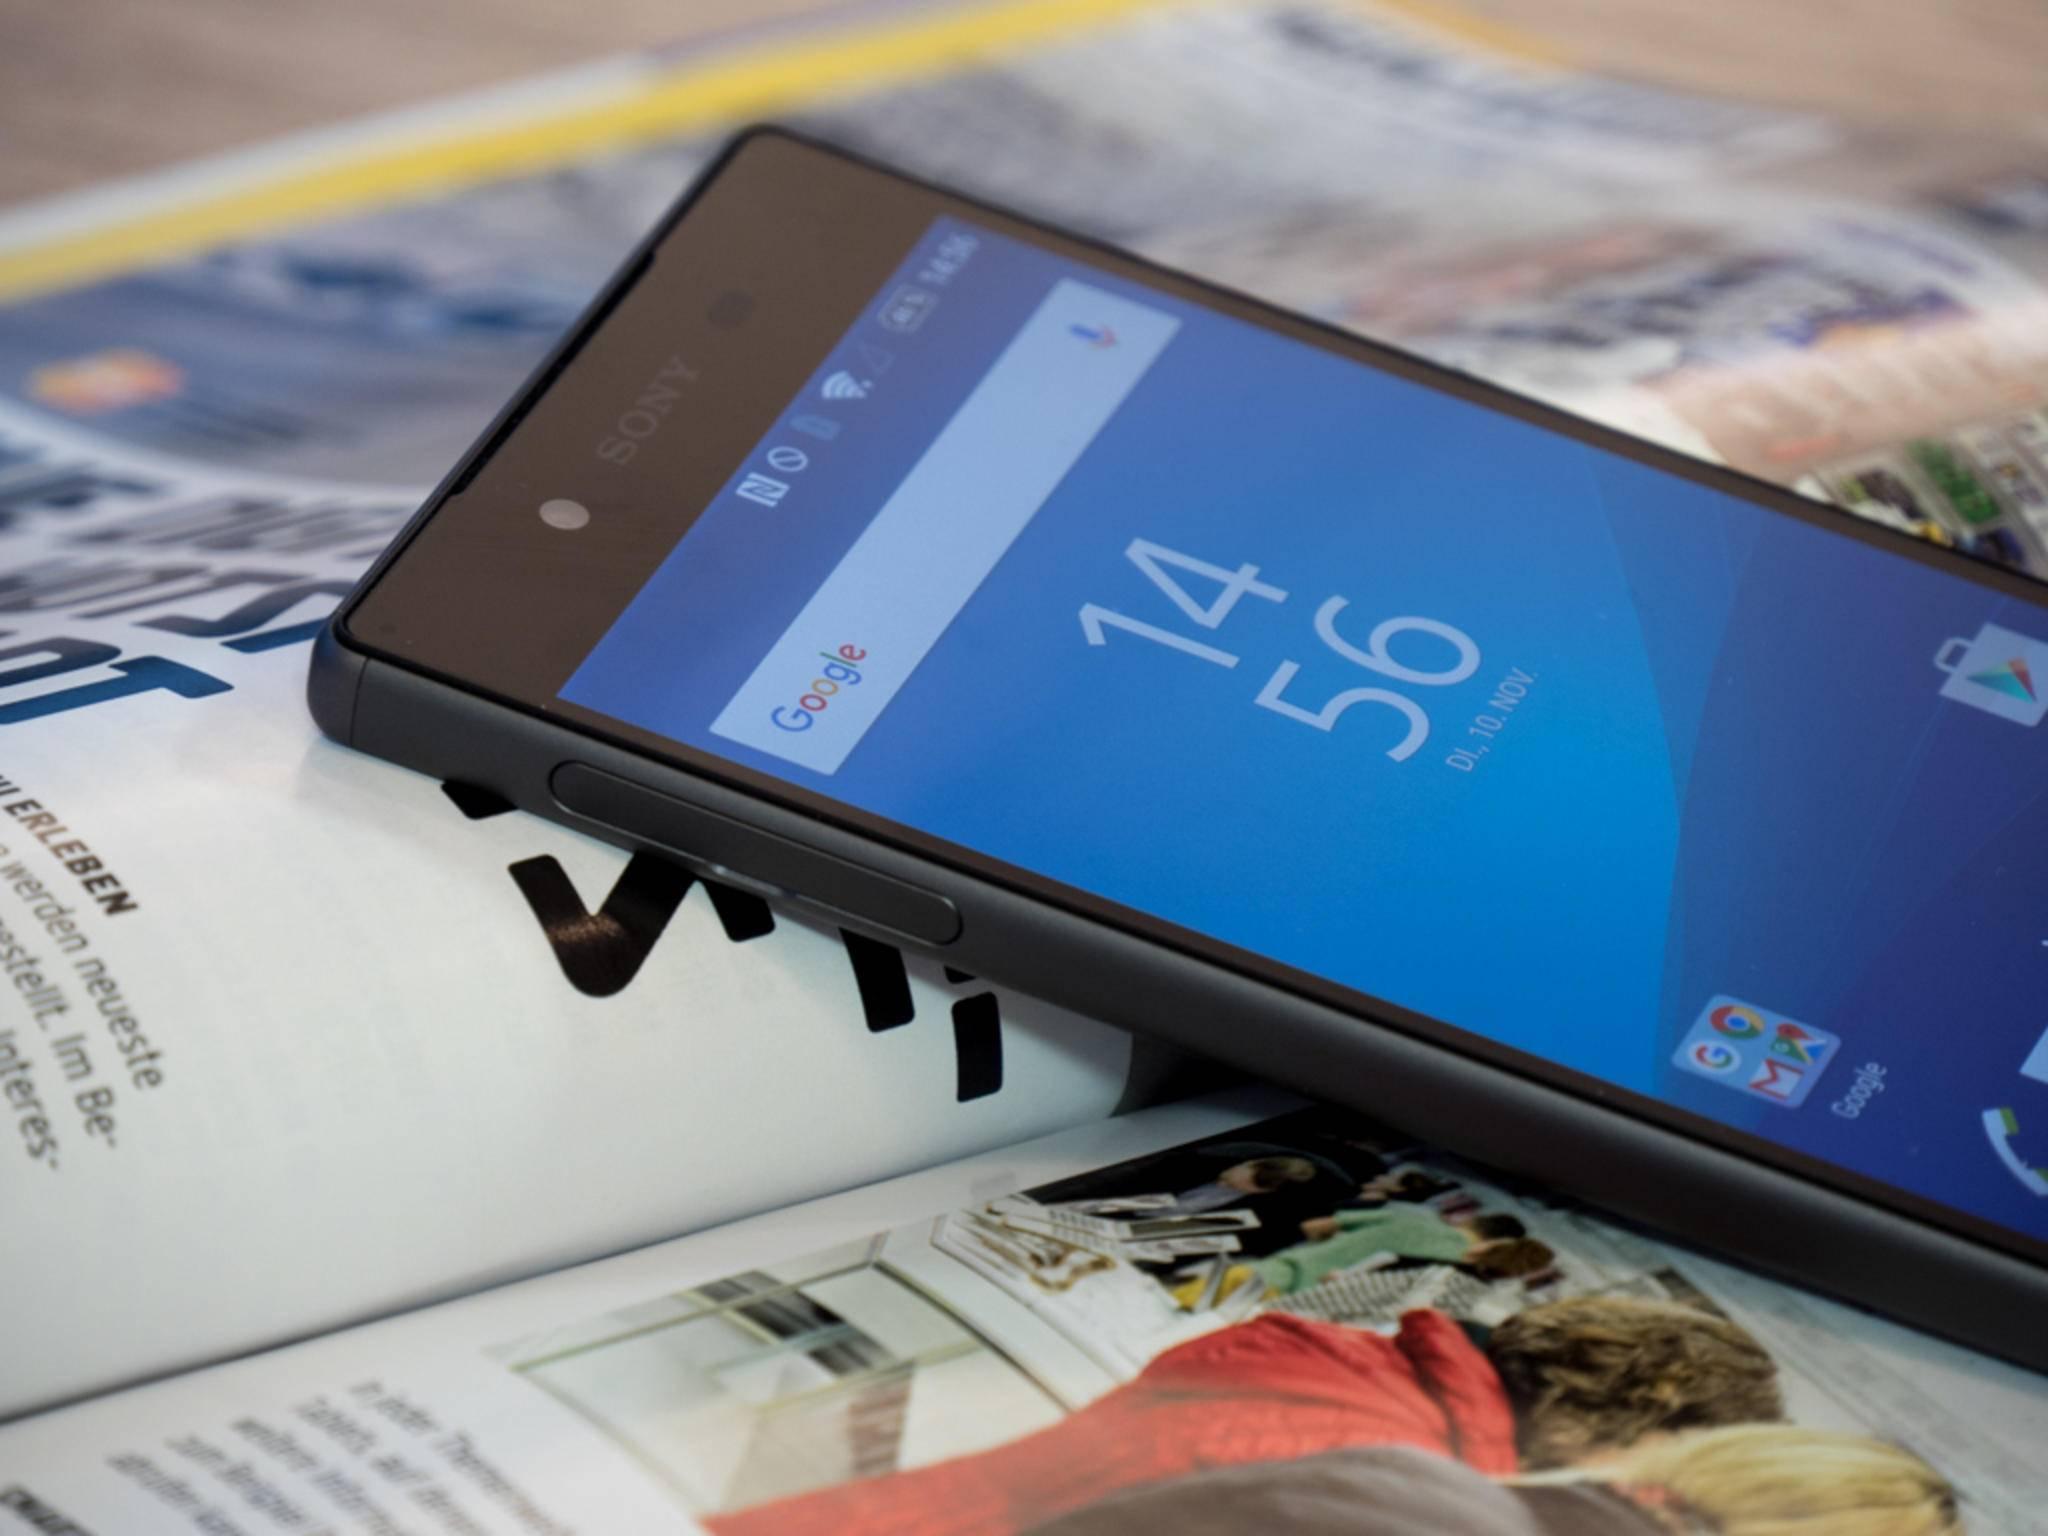 Auf dem Xperia Z5 soll bald Android 6.0 Marshmallow laufen.